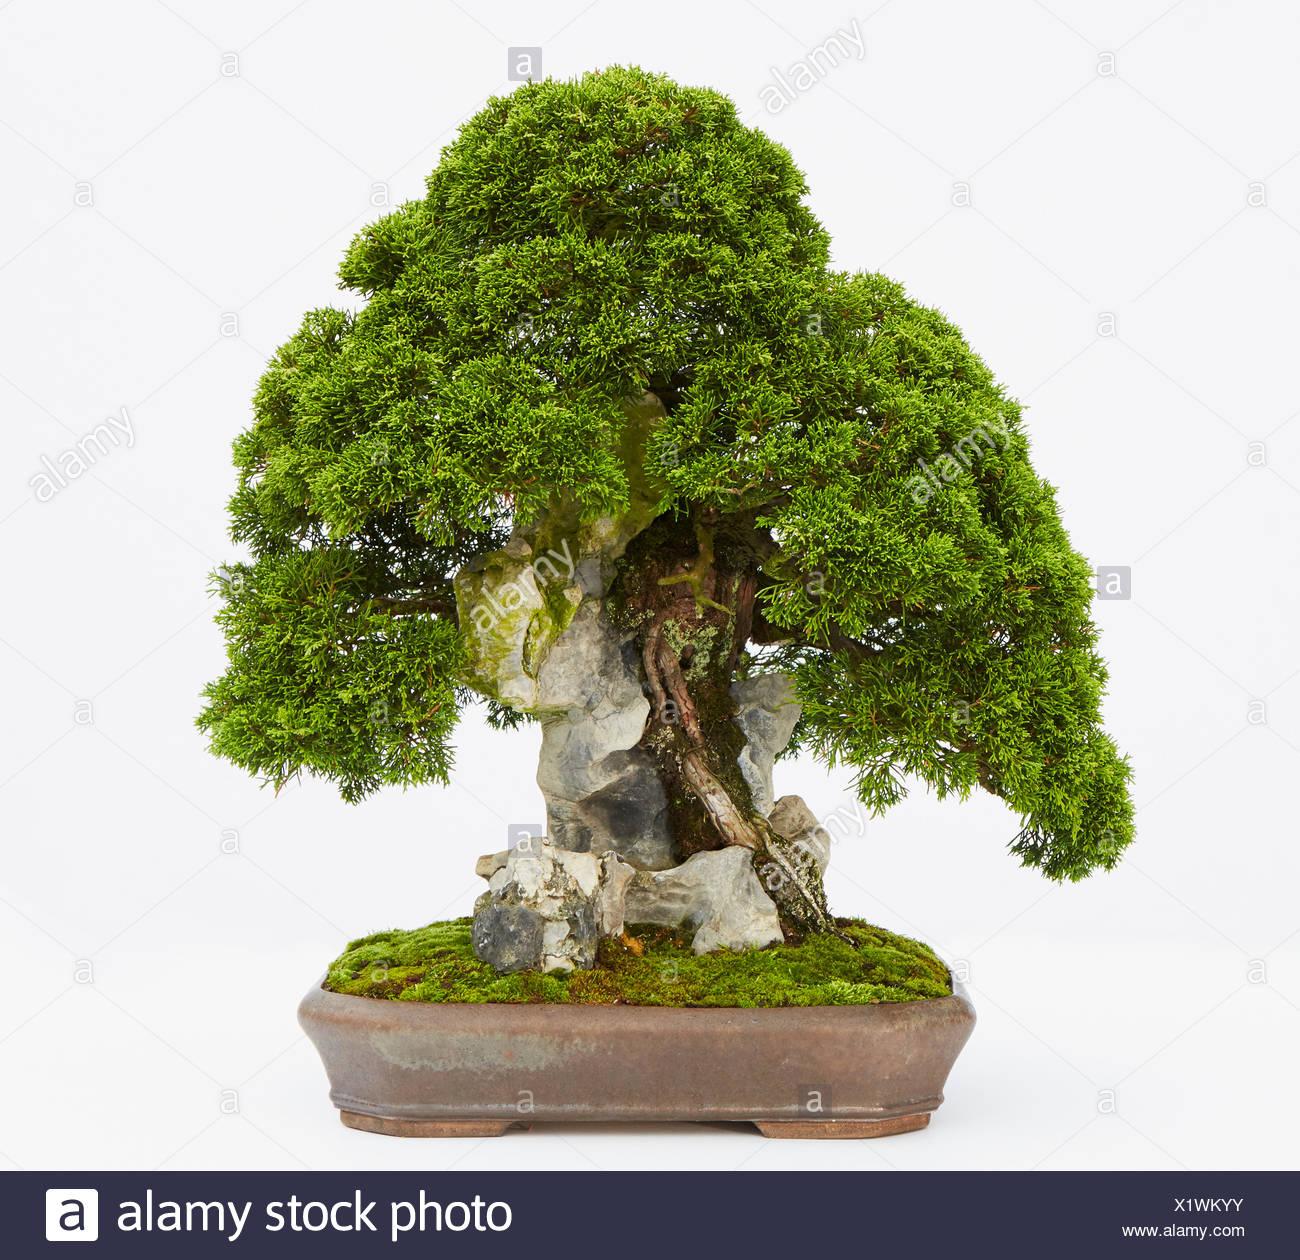 juniperus chinensis stockfotos juniperus chinensis bilder alamy. Black Bedroom Furniture Sets. Home Design Ideas